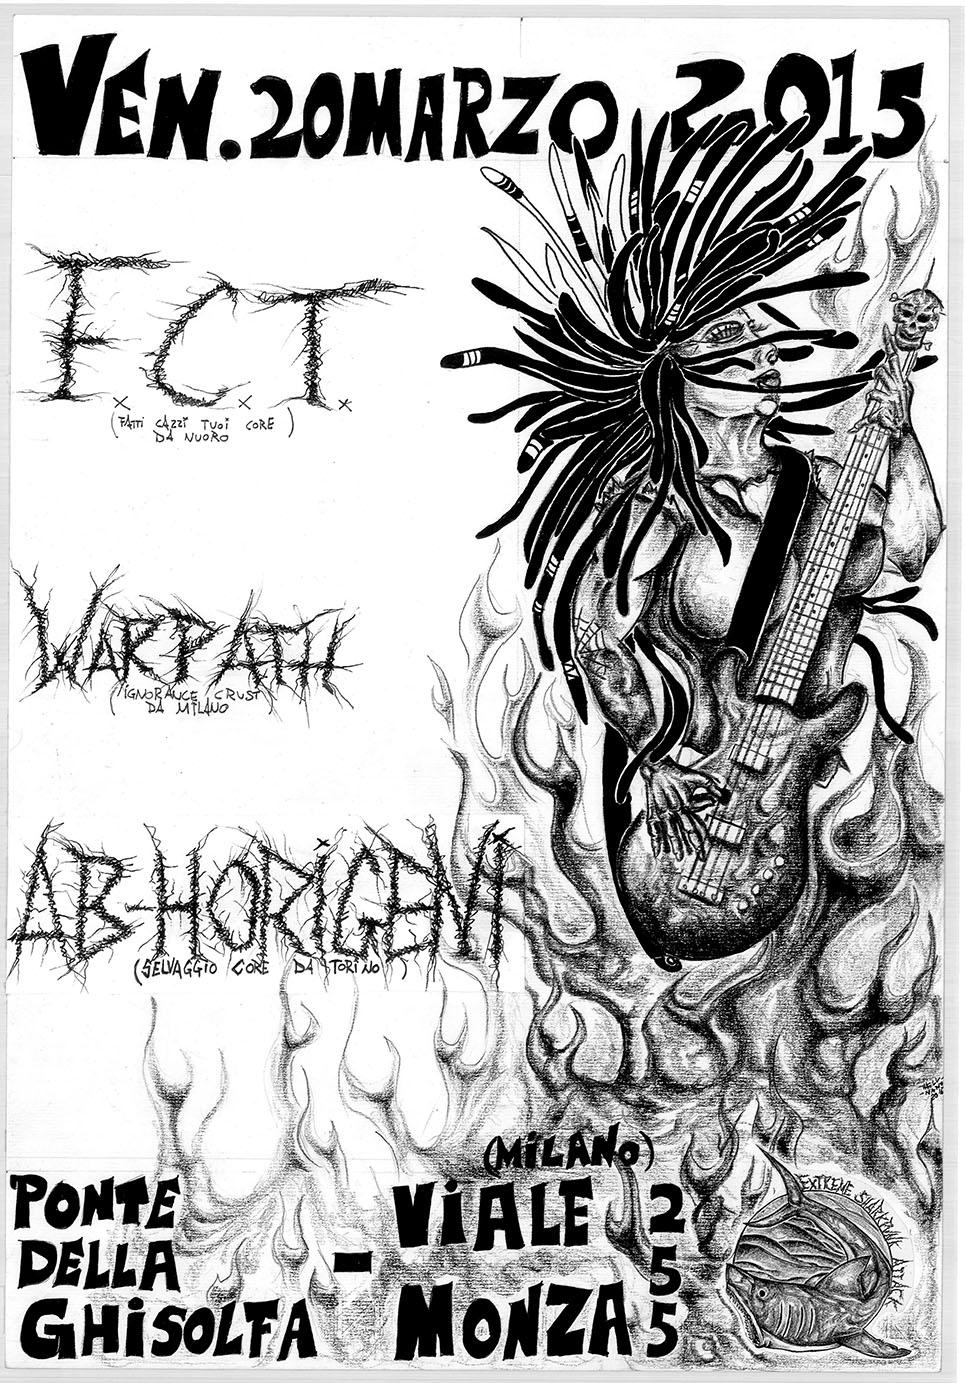 F.C.T + ab-horigeni + warpath